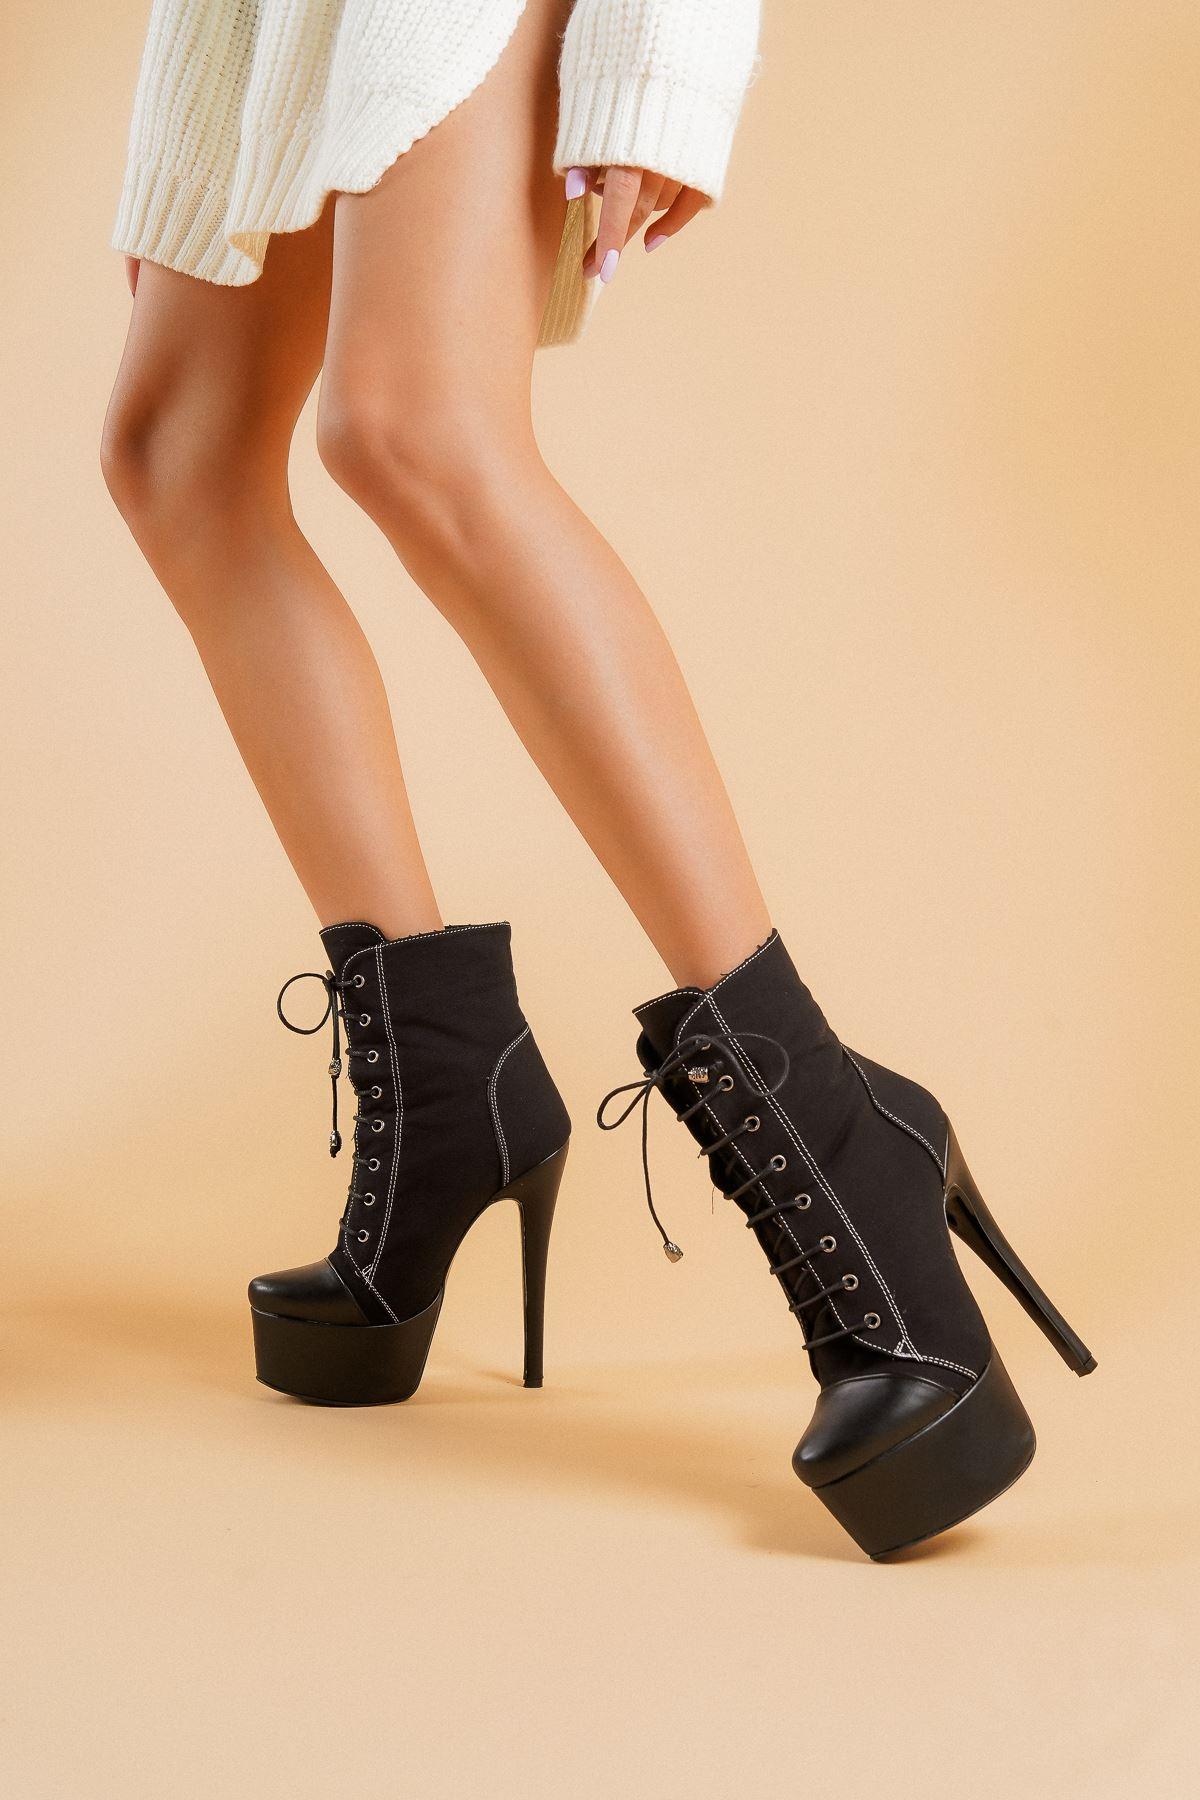 AllStar Siyah Keten Siyah Cilt Topuklu Kadın Bot